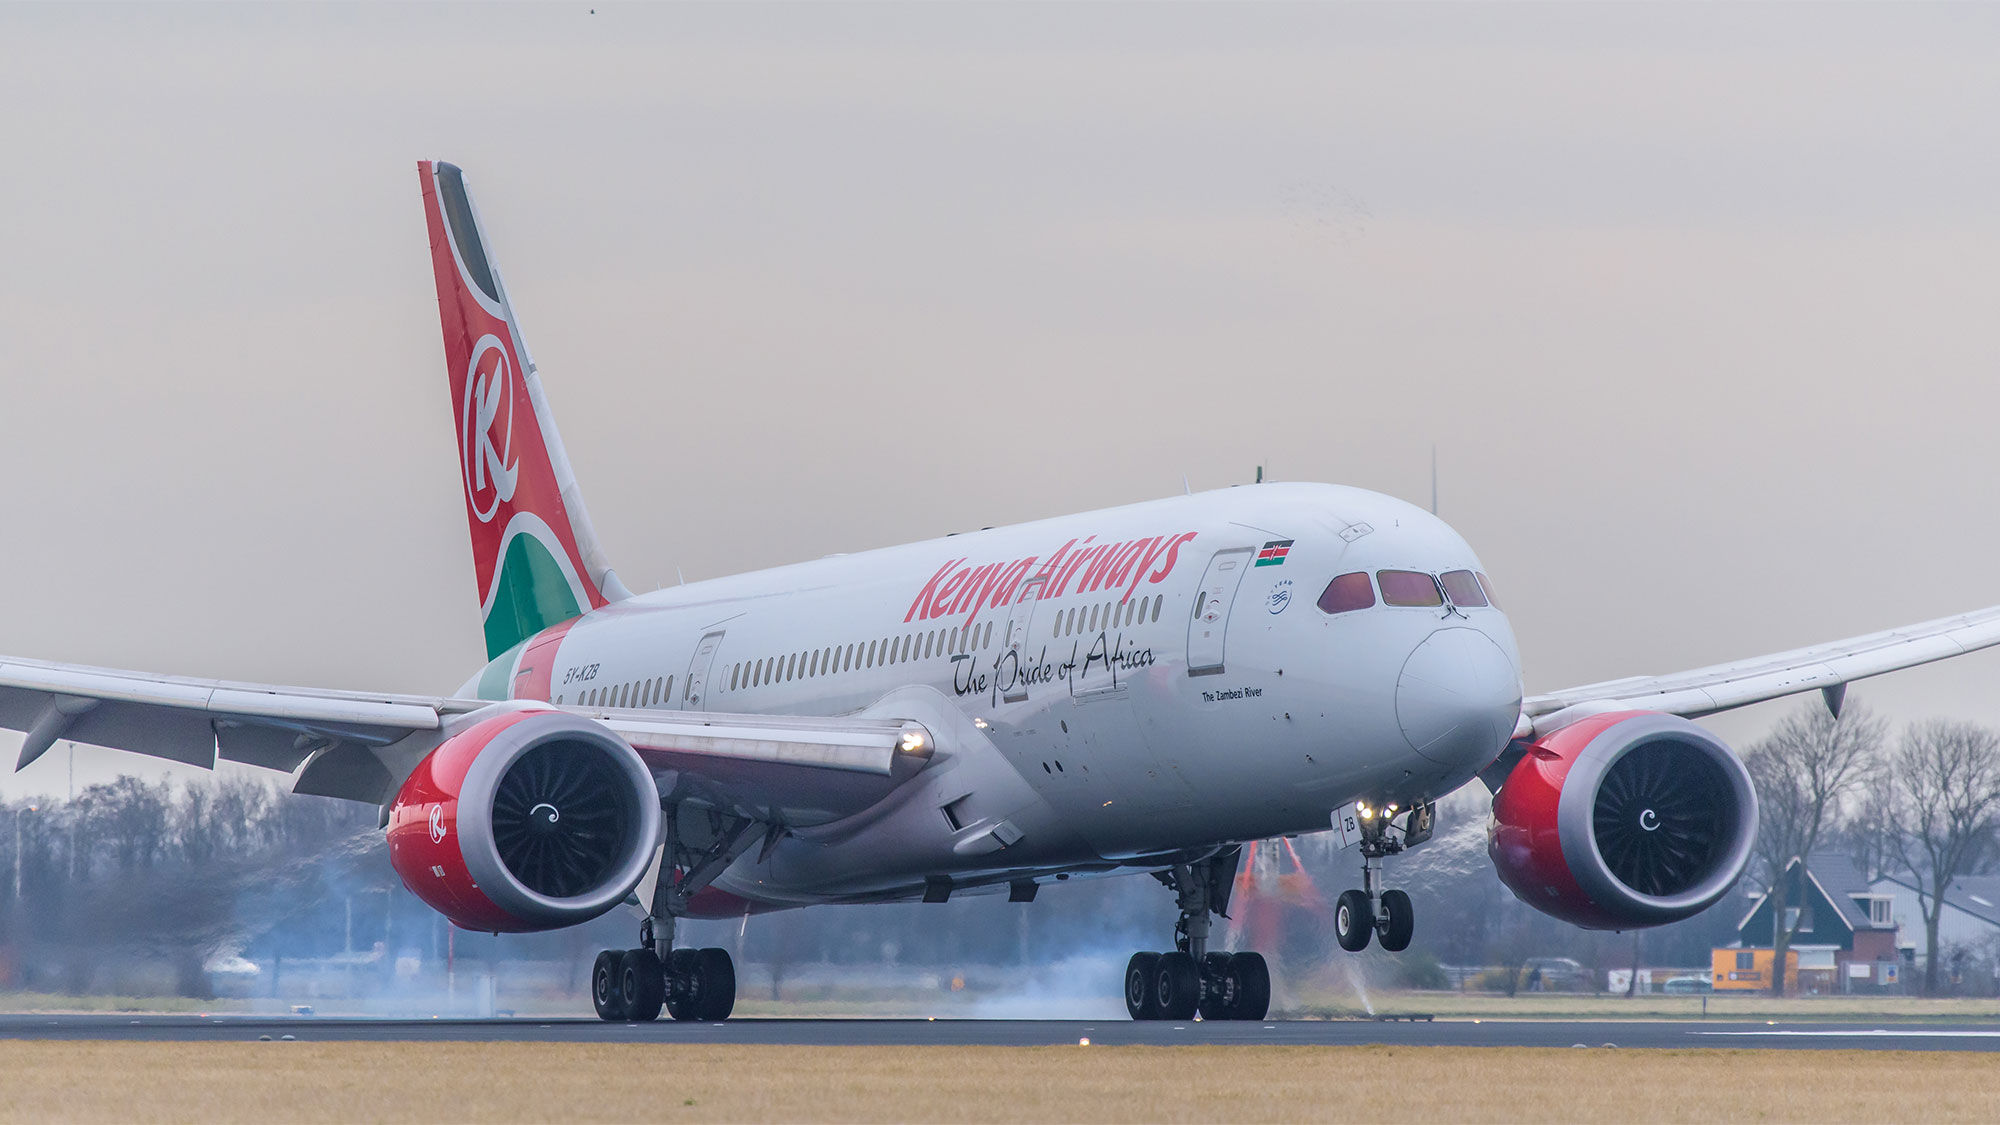 Kenya Airways 787 [Credit: Nieuwland Photography/Shutterstock.com]